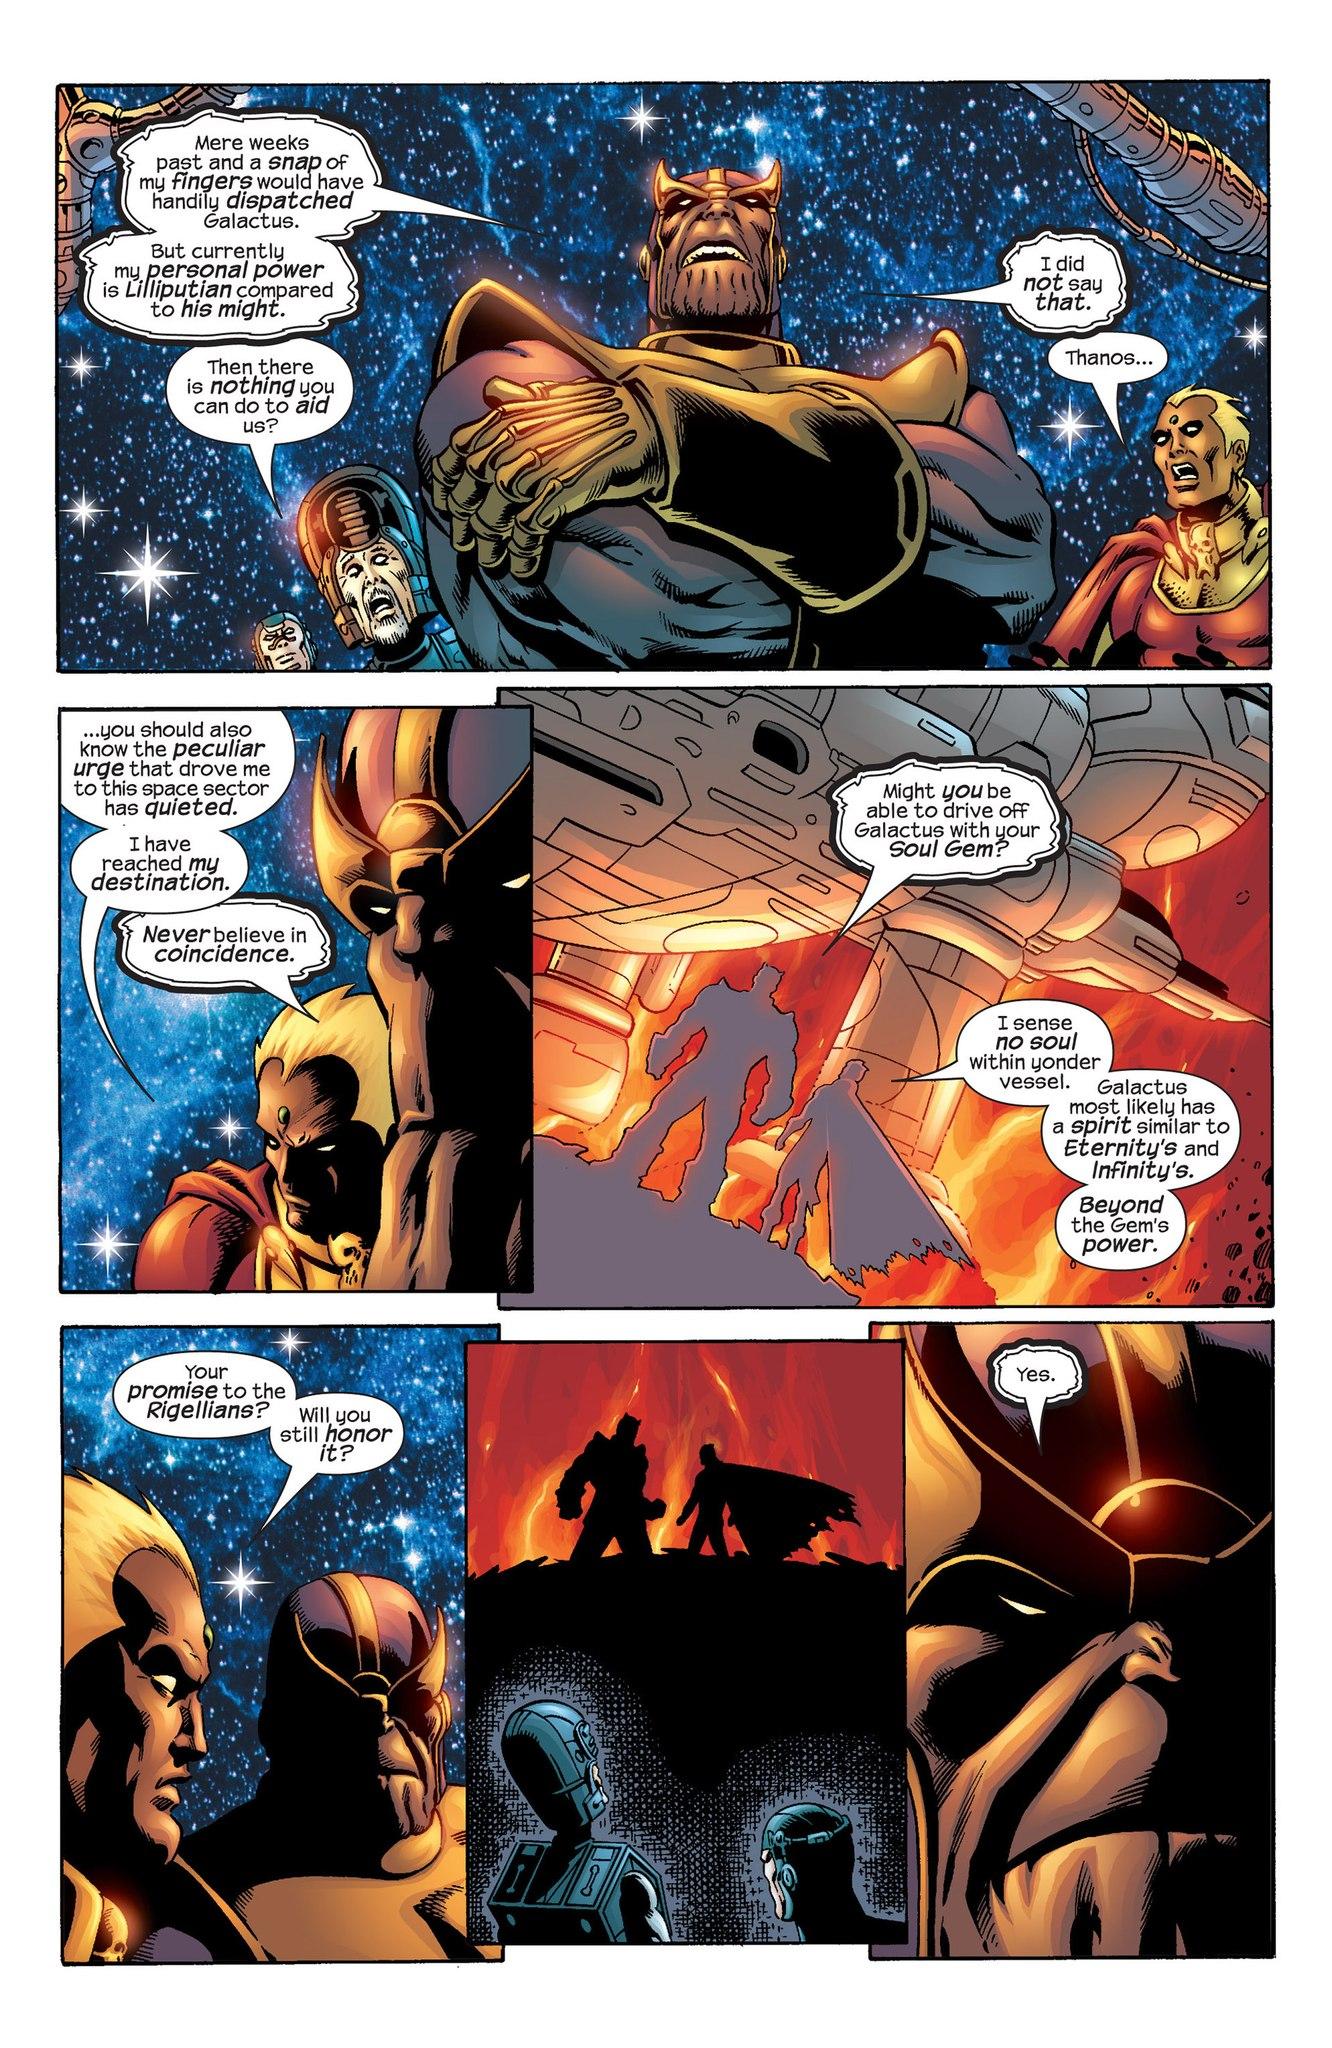 Galactus Marvel Comics Vs Battles Wiki Fandom